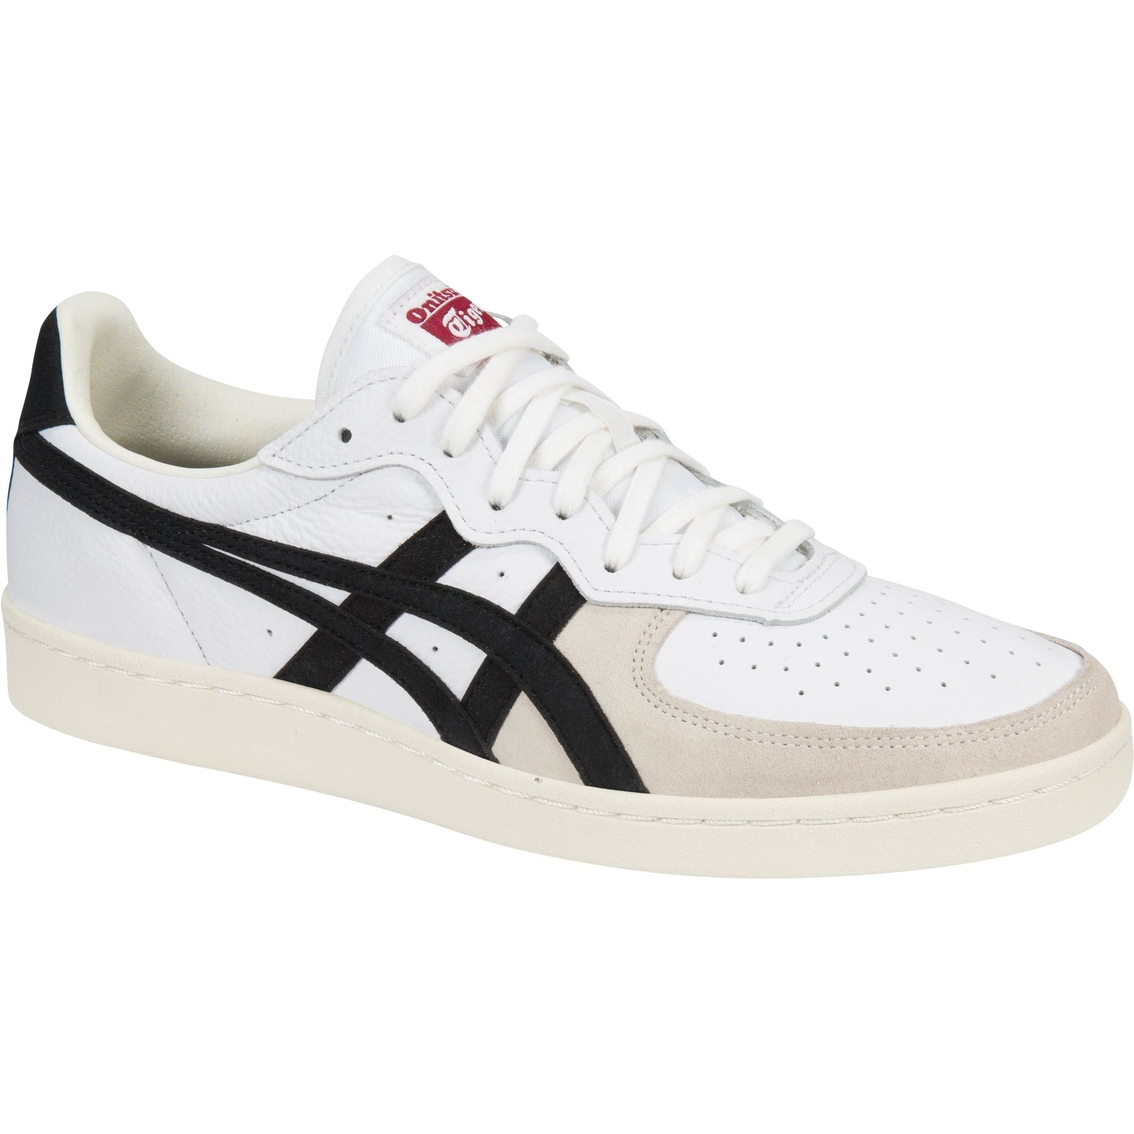 promo code 0d997 6b79c Asics Men's Onitsuka Tiger Gsm Shoes | Casuals | Shoes ...